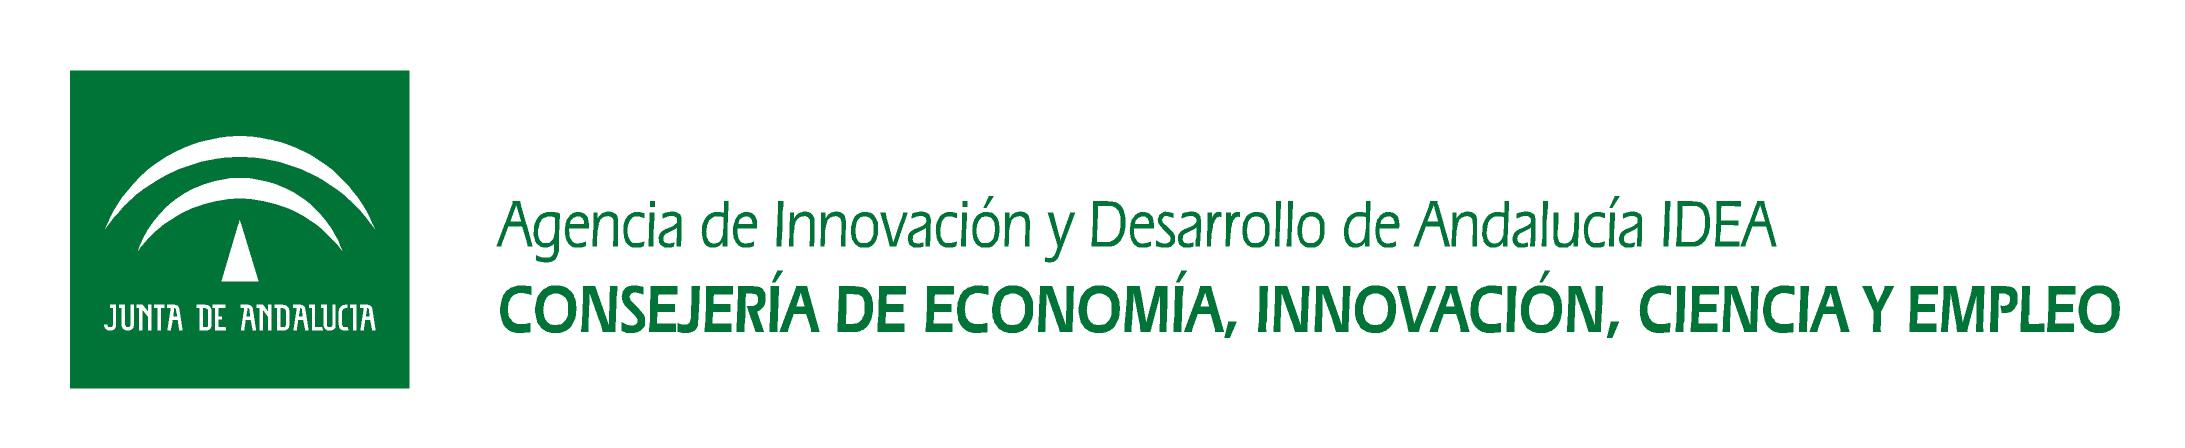 Agencia IDEA